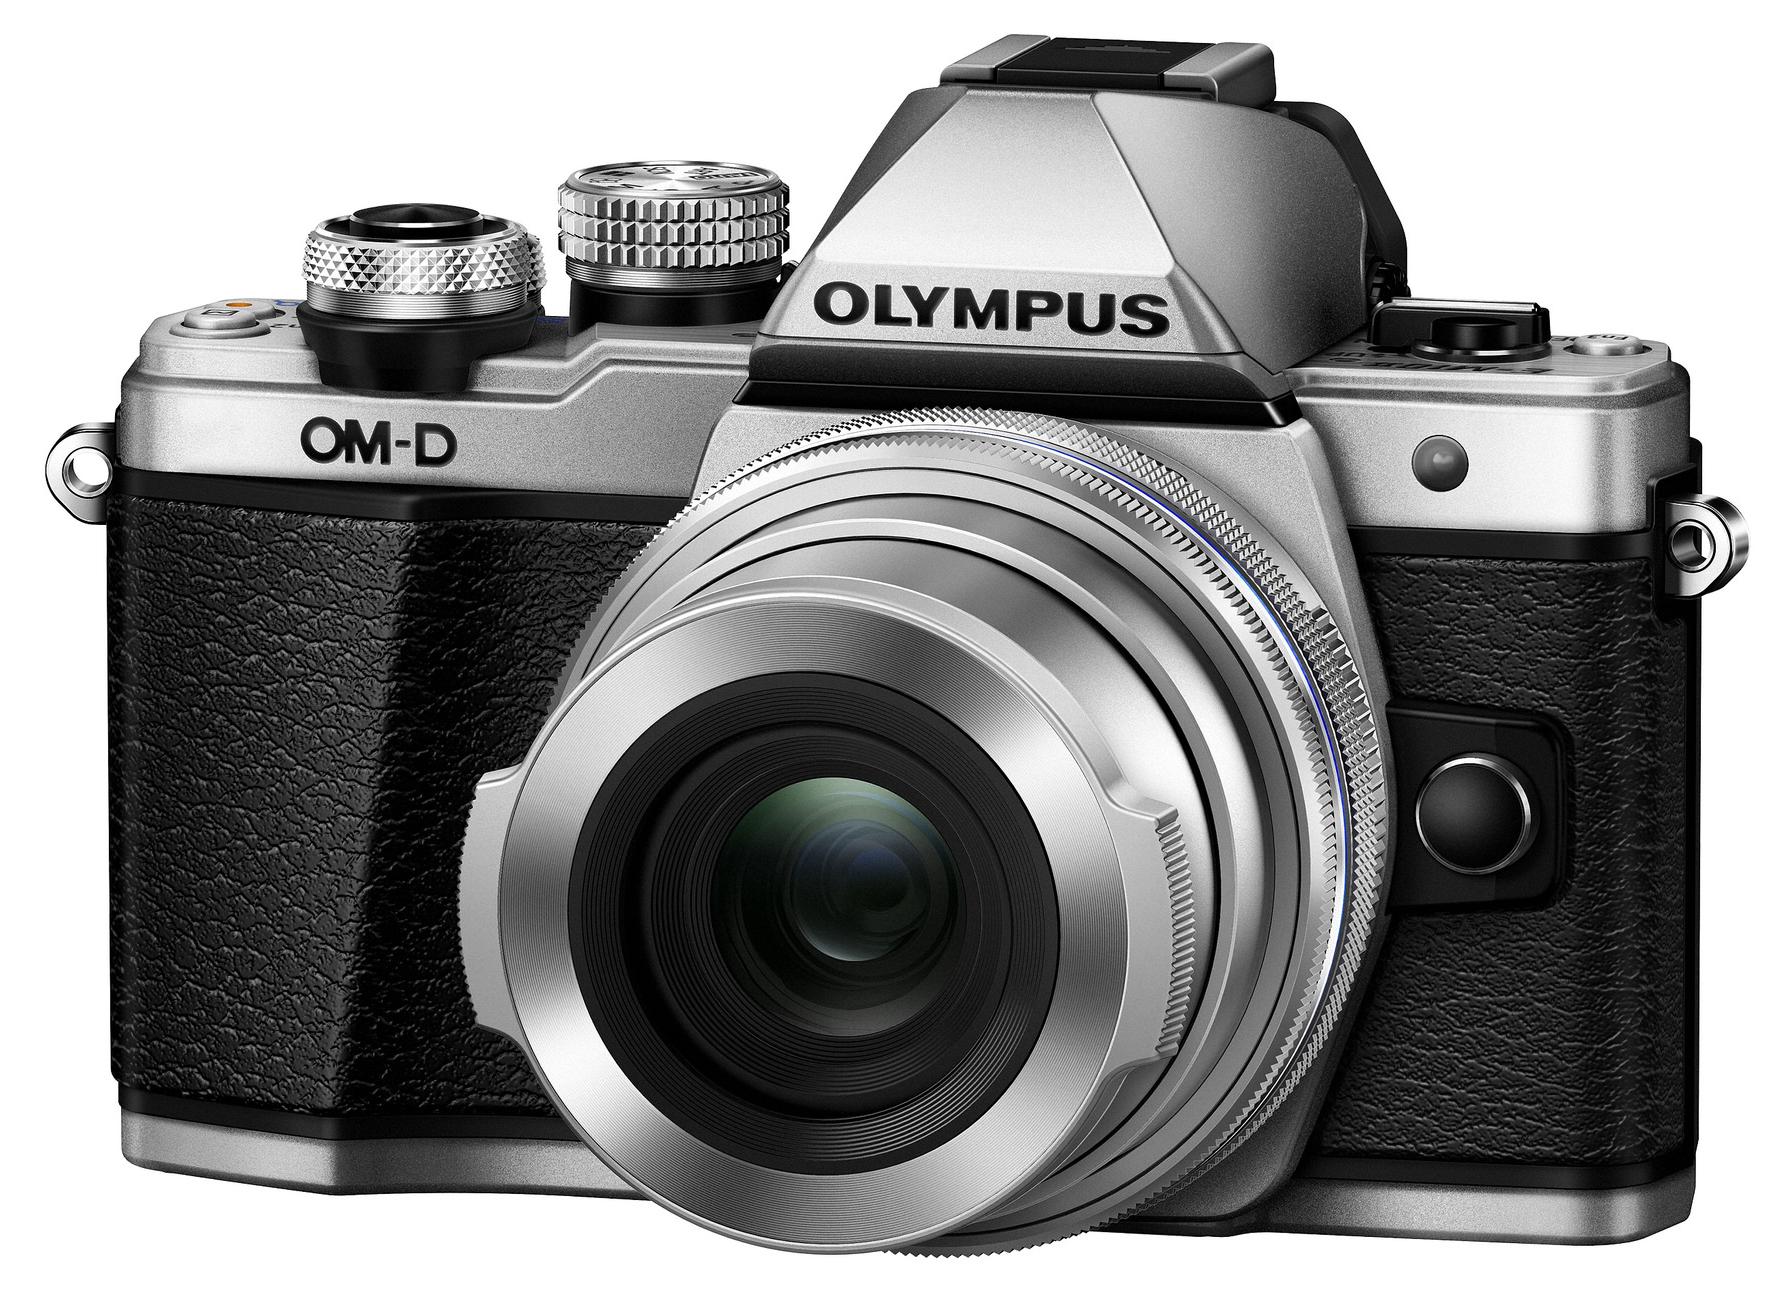 olympus om-d e-m10 firmware 1.2